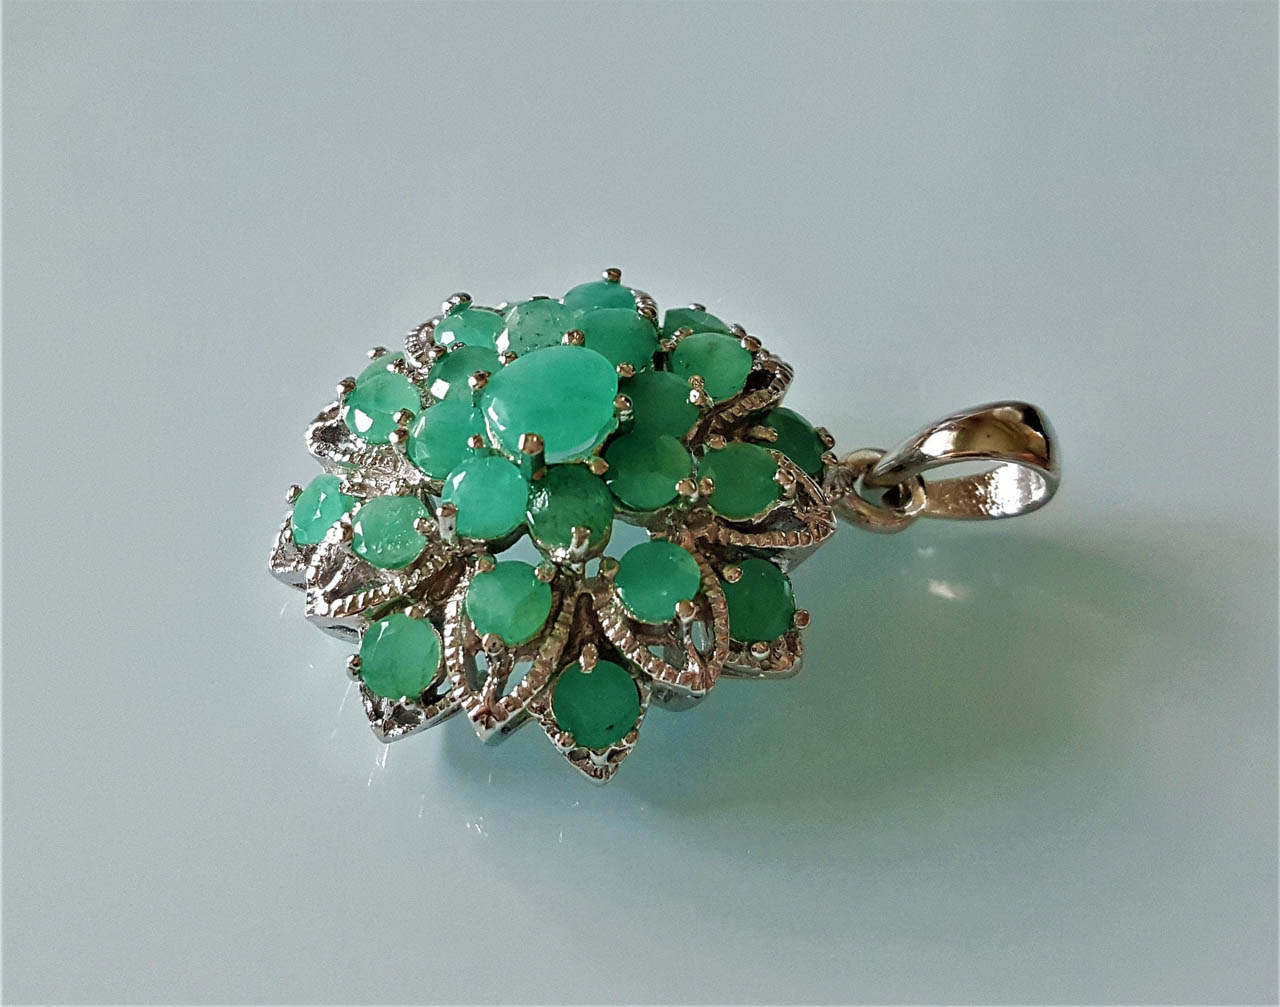 Syntactic Emerald Gemstone Traditional 925 Sterling Silver Flower Designer Pendant Handmade Jewelry